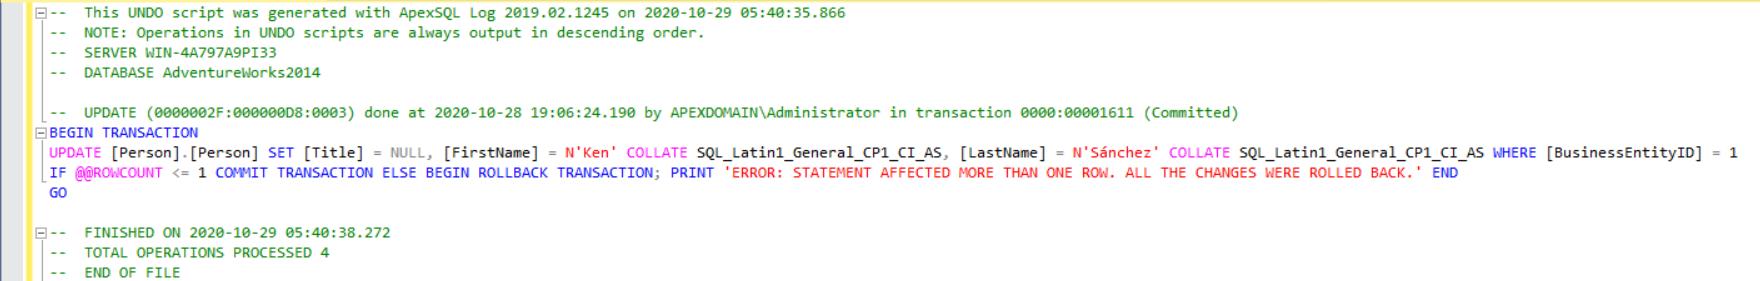 Undo script based on SQL Server transaction log